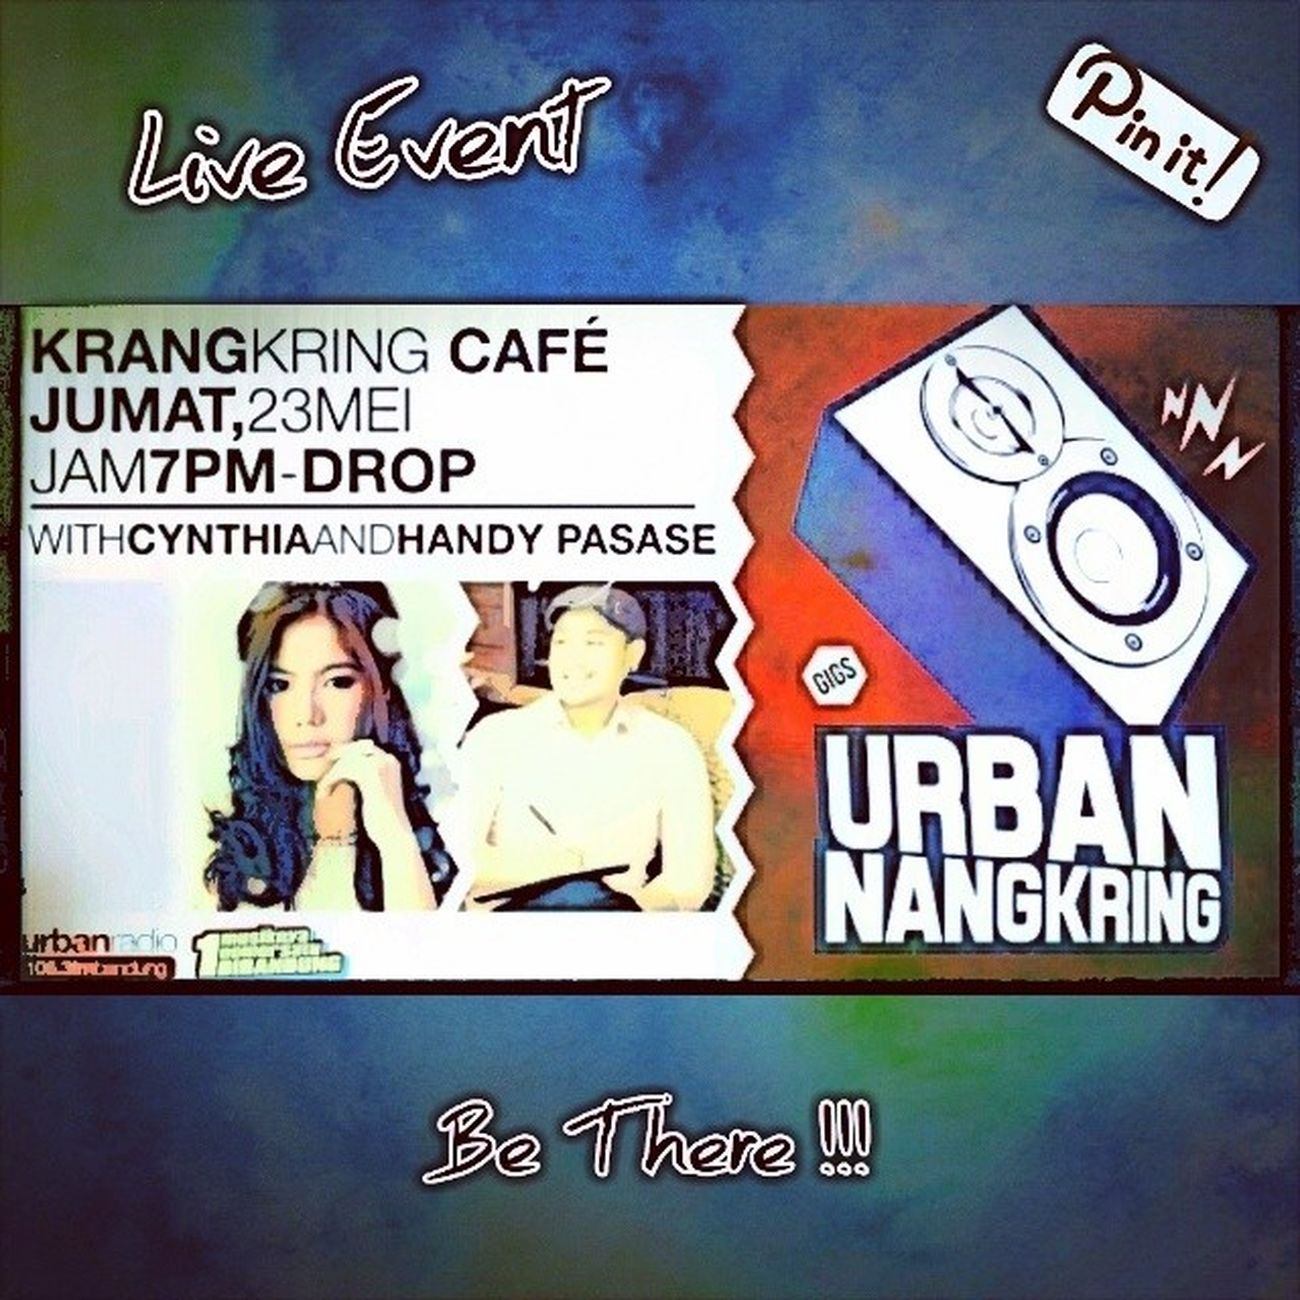 LiveEvent HandyPasase KrangKringCafe Bandung Today